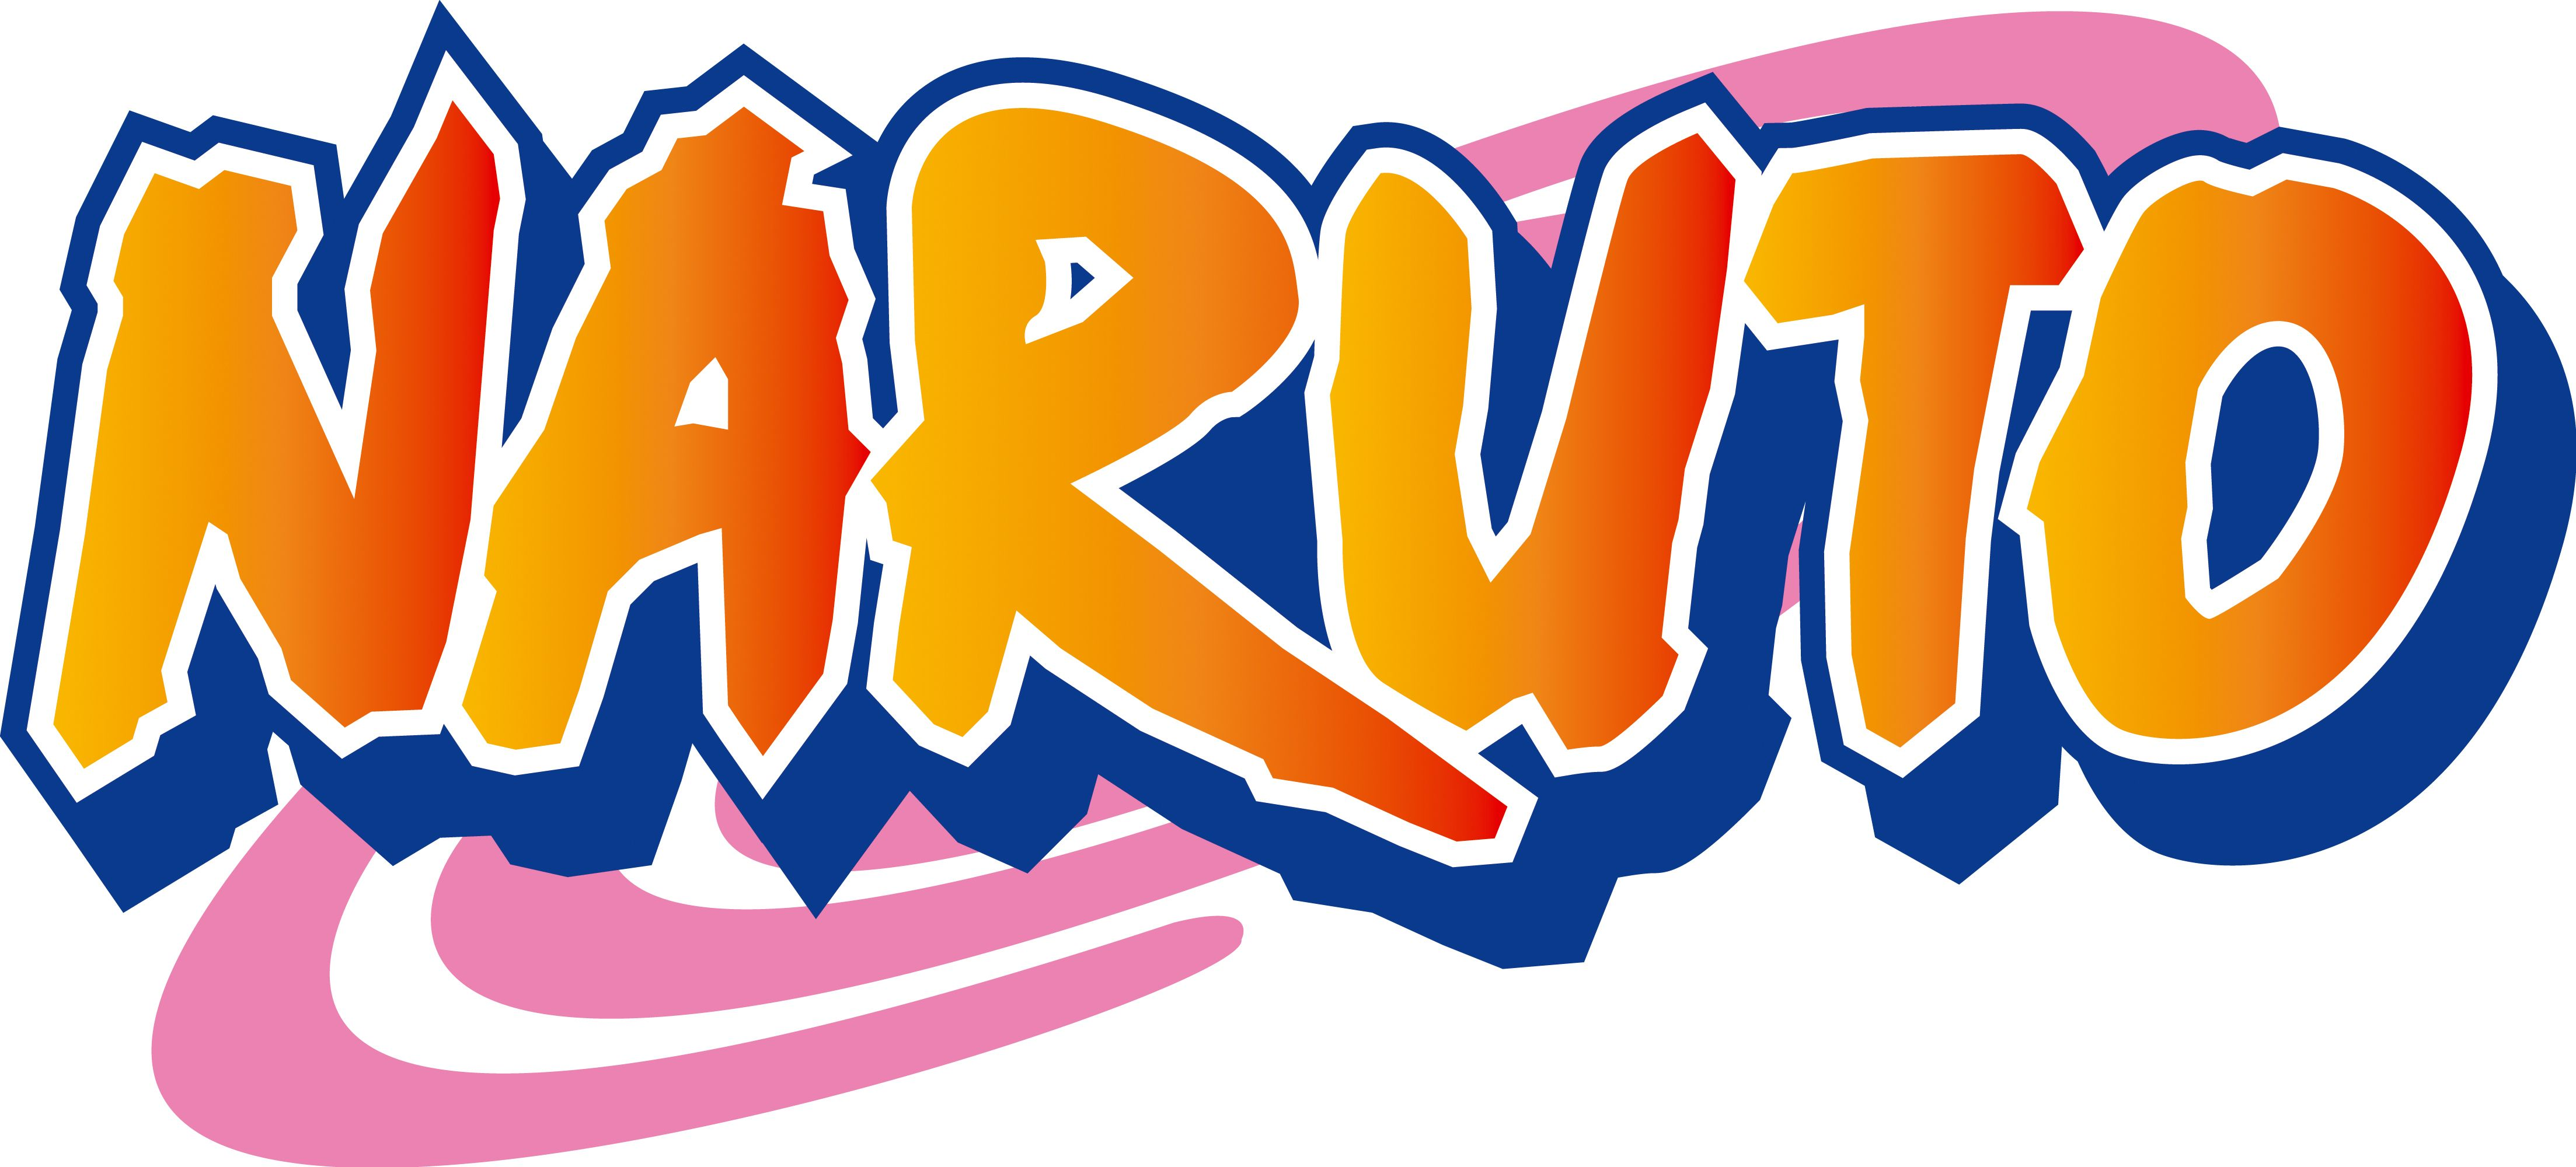 Naruto logo Wallpaper.